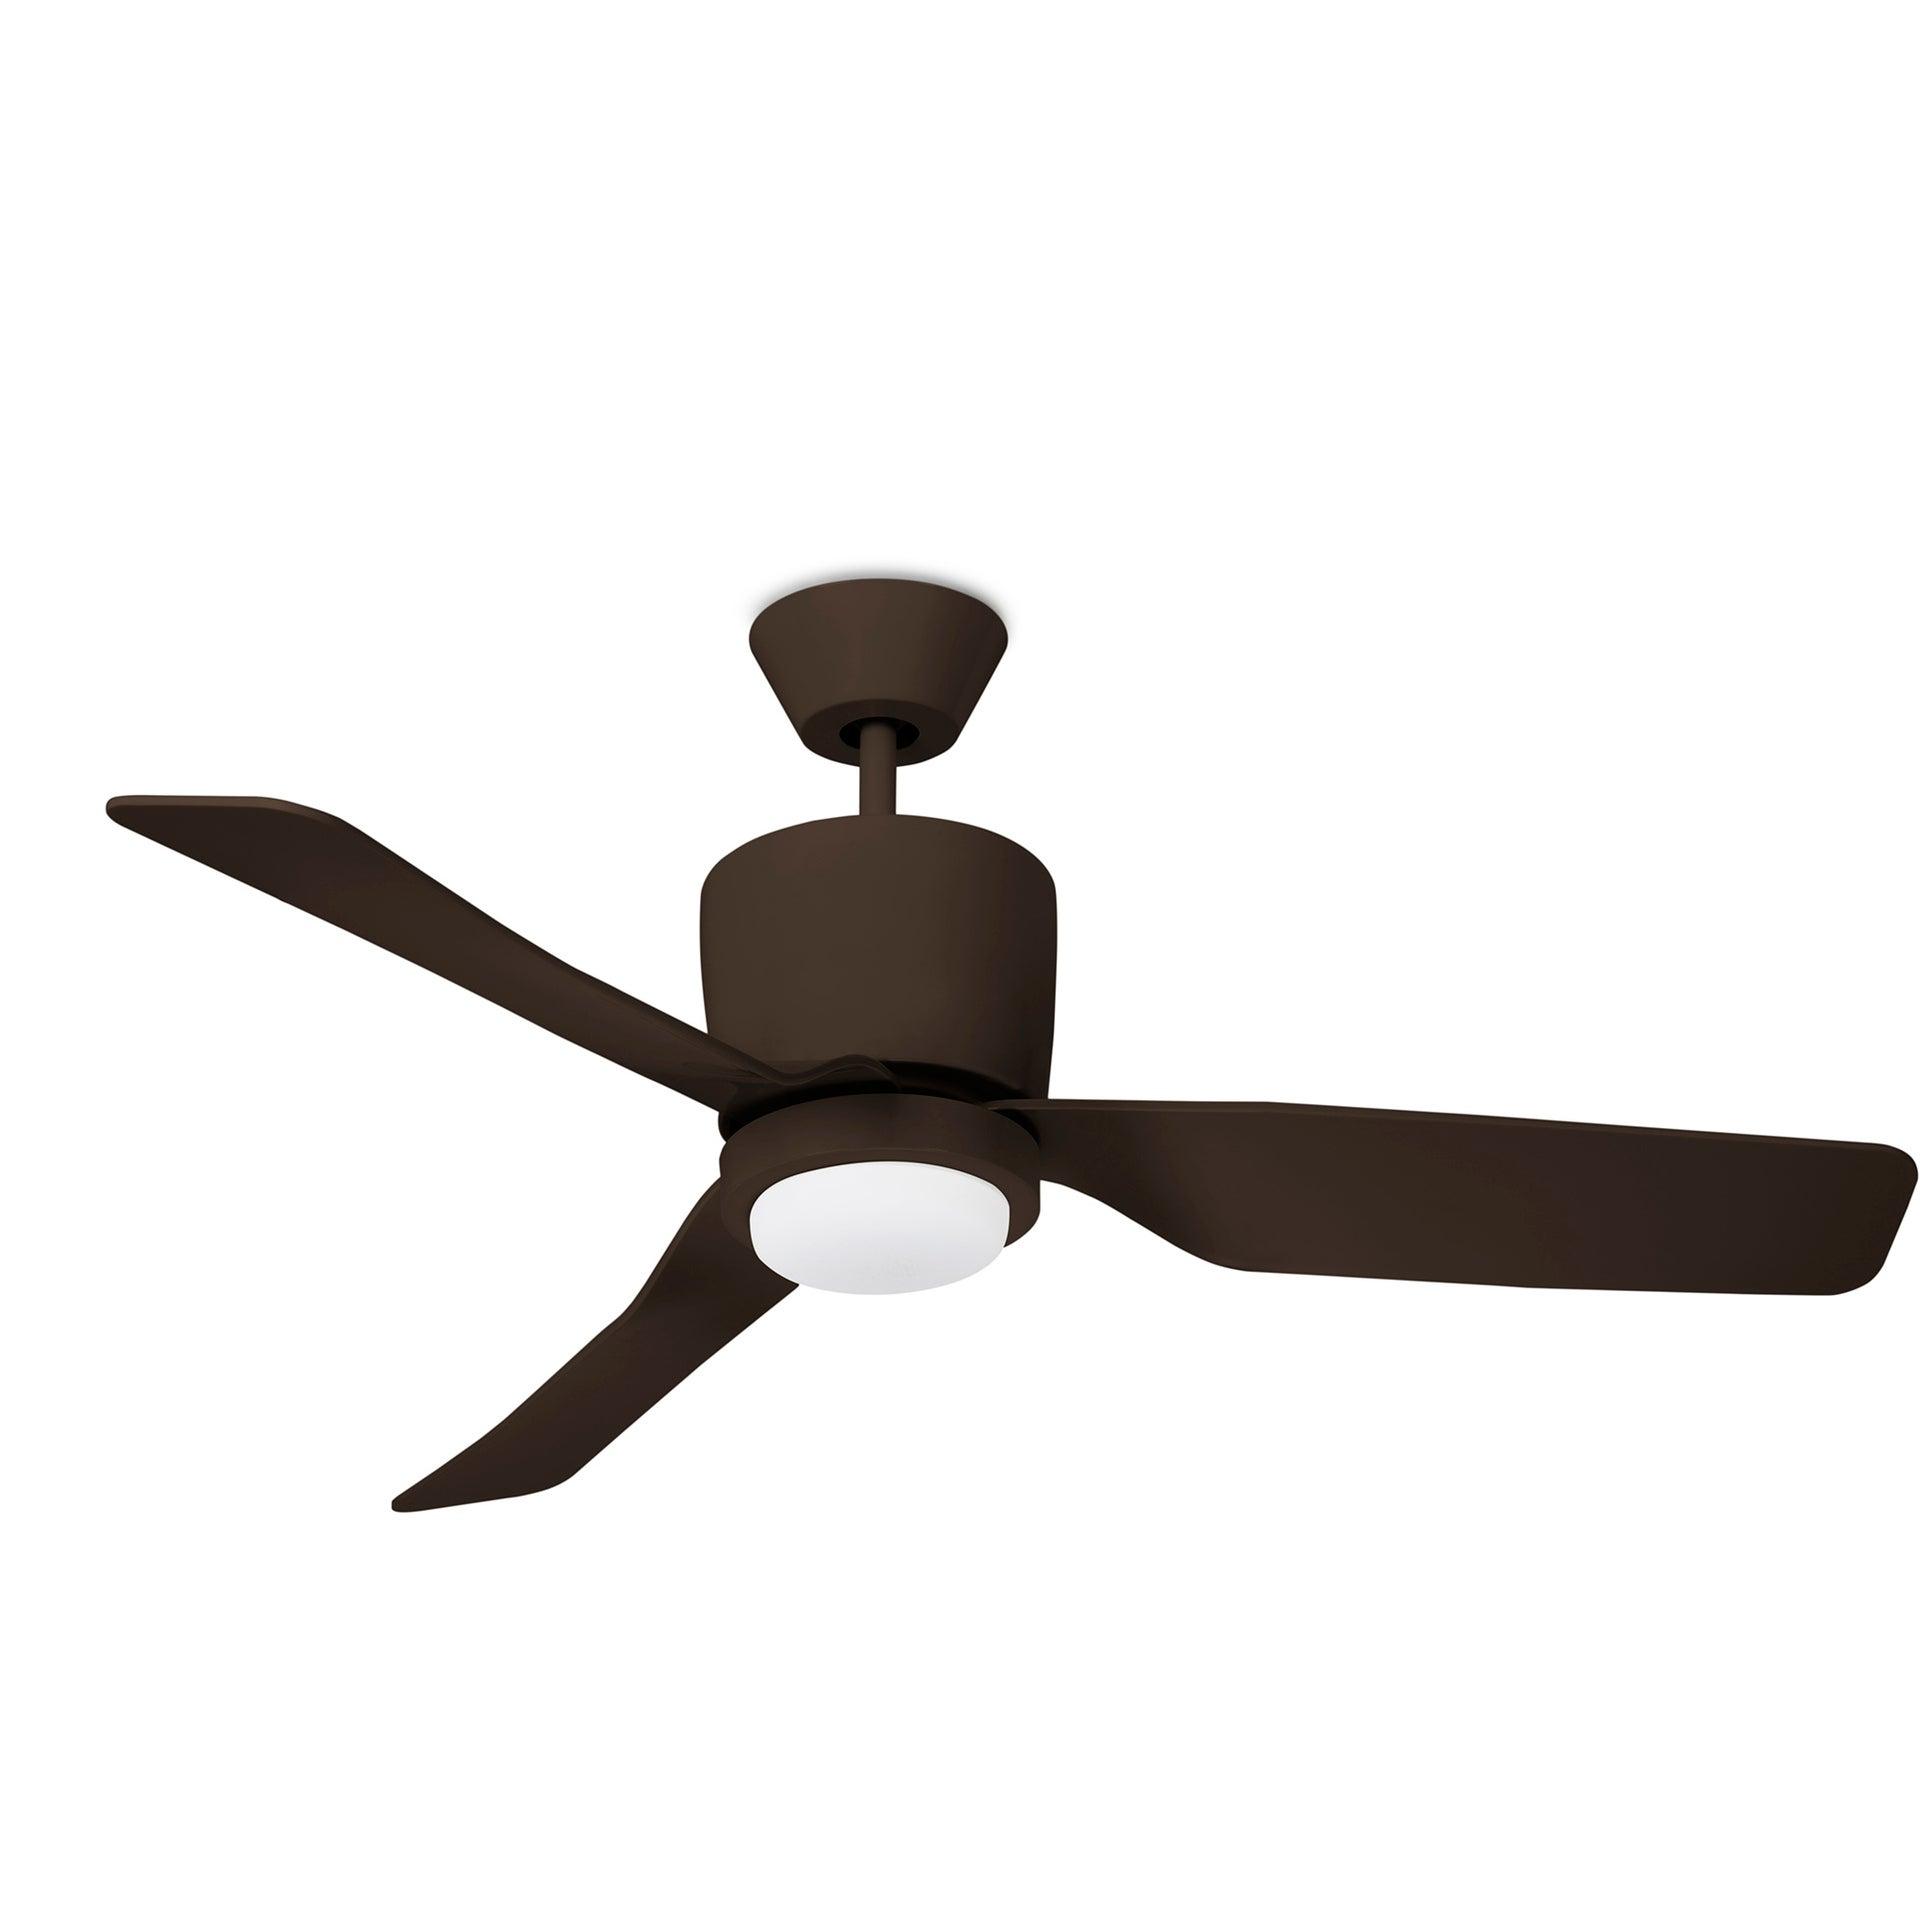 Ventilateur plafond au meilleur prix | Leroy Merlin